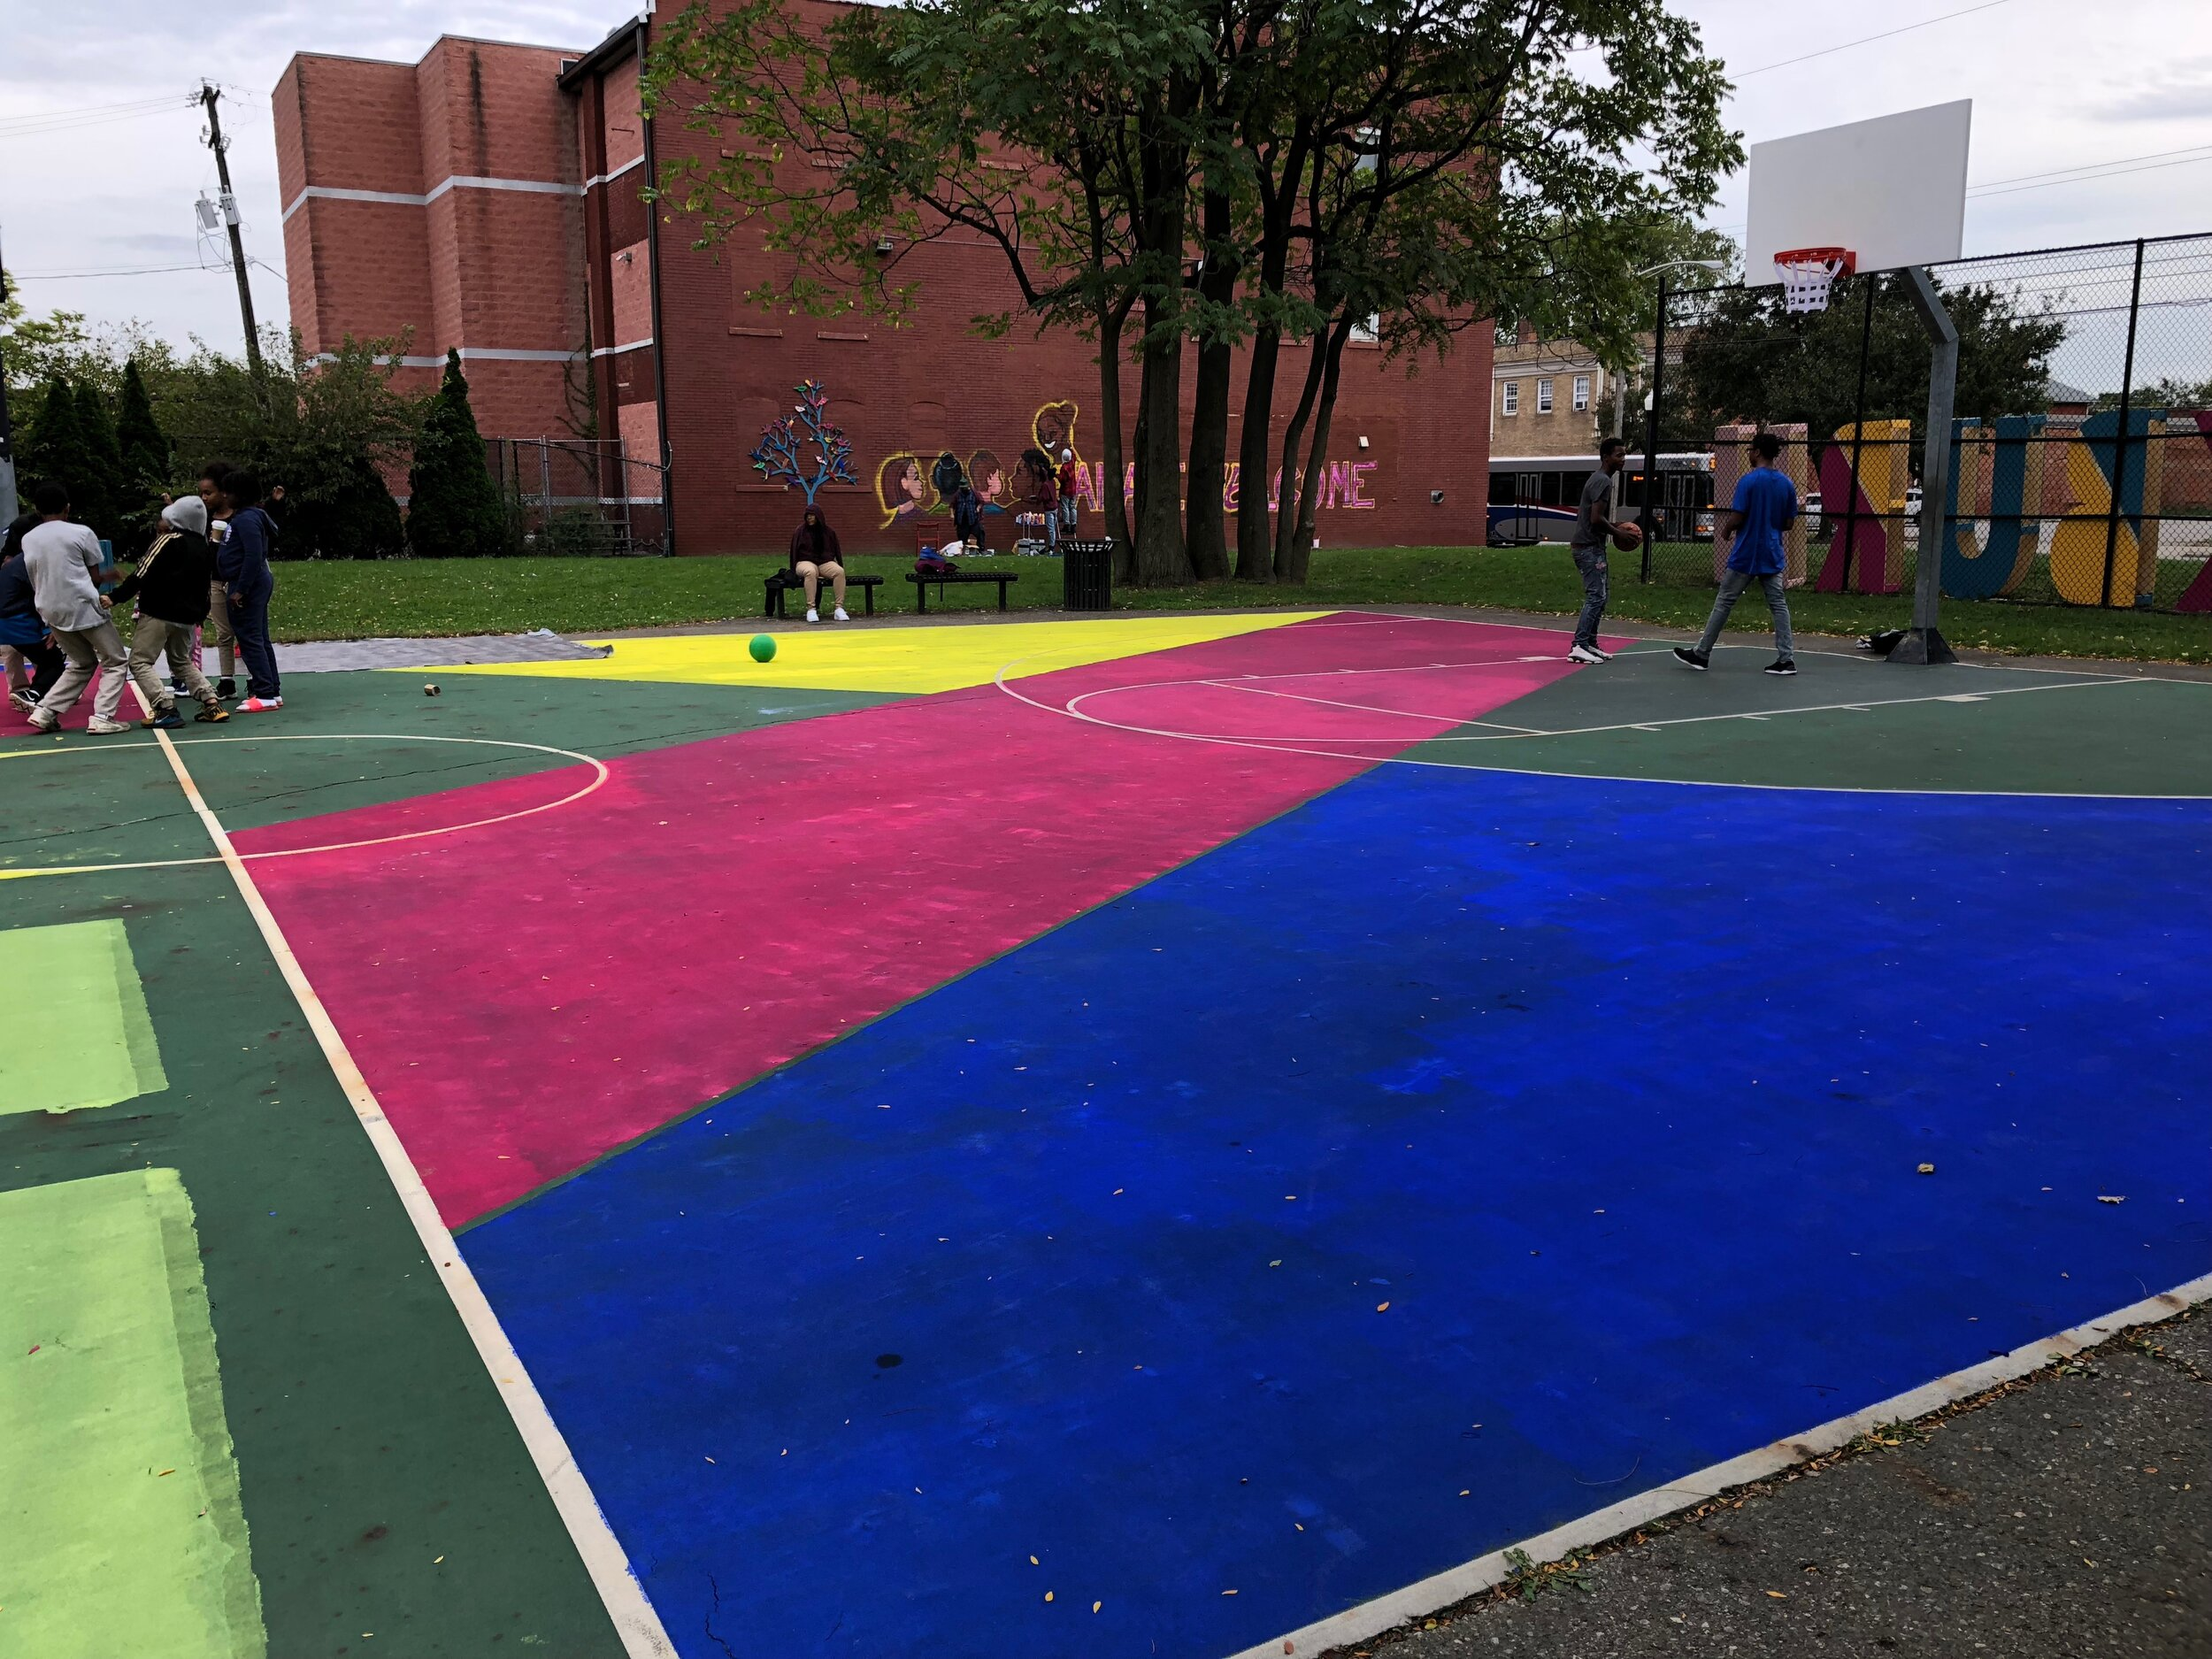 Blackburn Recreation Center Artistic Basketball Court